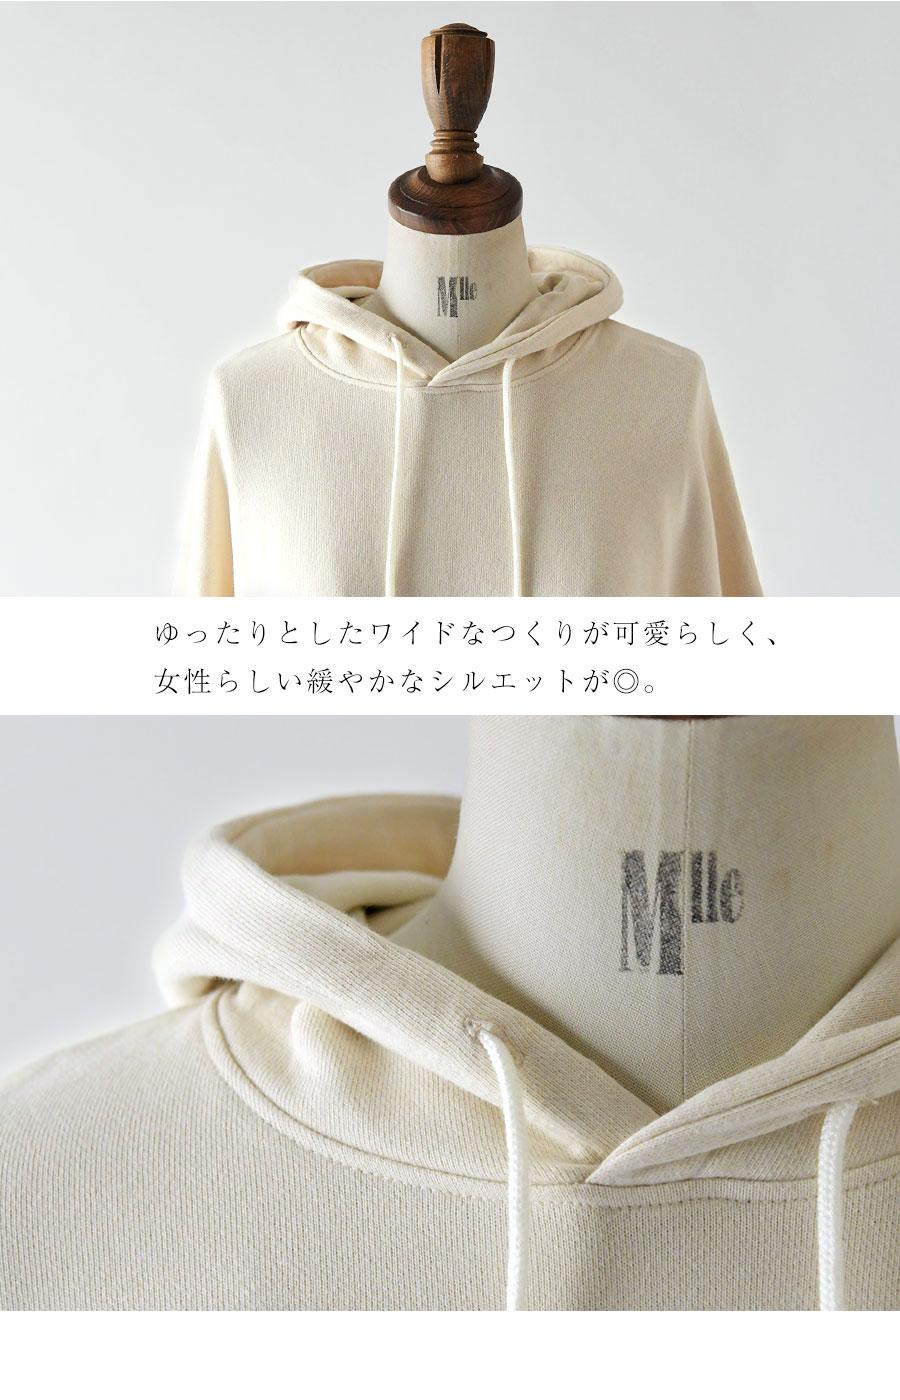 【NARU ナル】セントラル 裏毛 テレコワイド プルオーバー パーカー (630022)